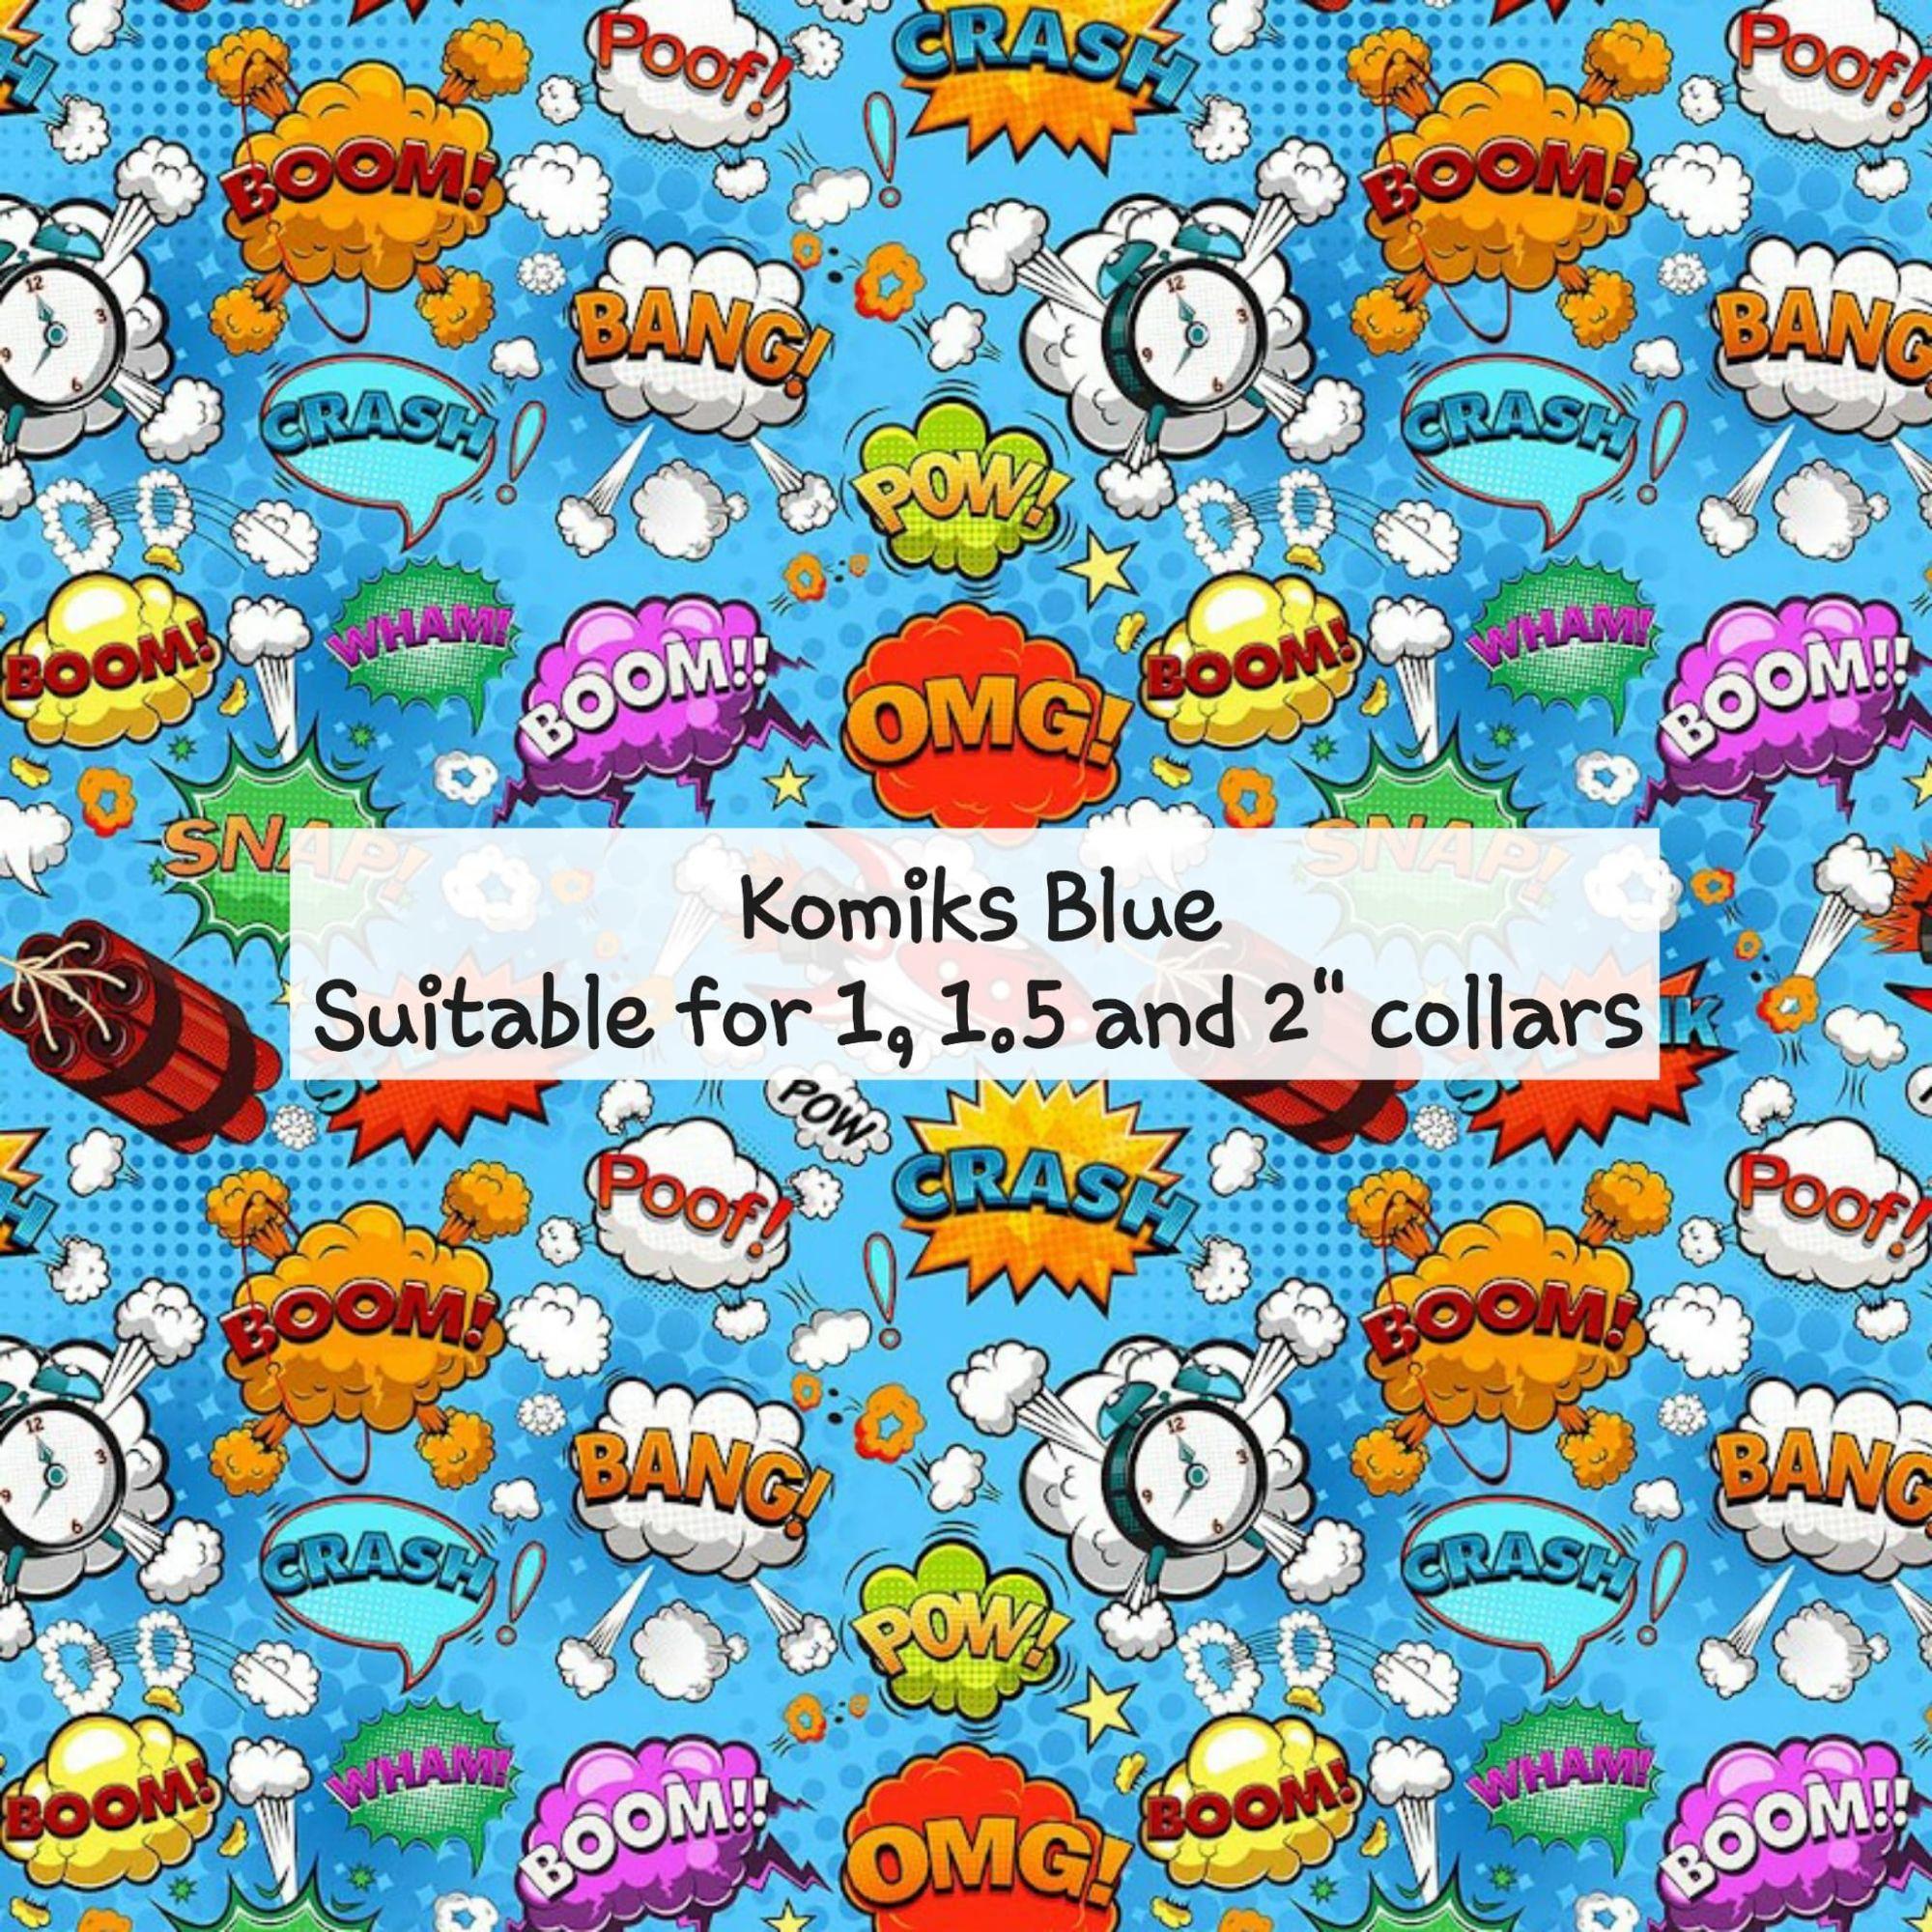 Komiks Blue